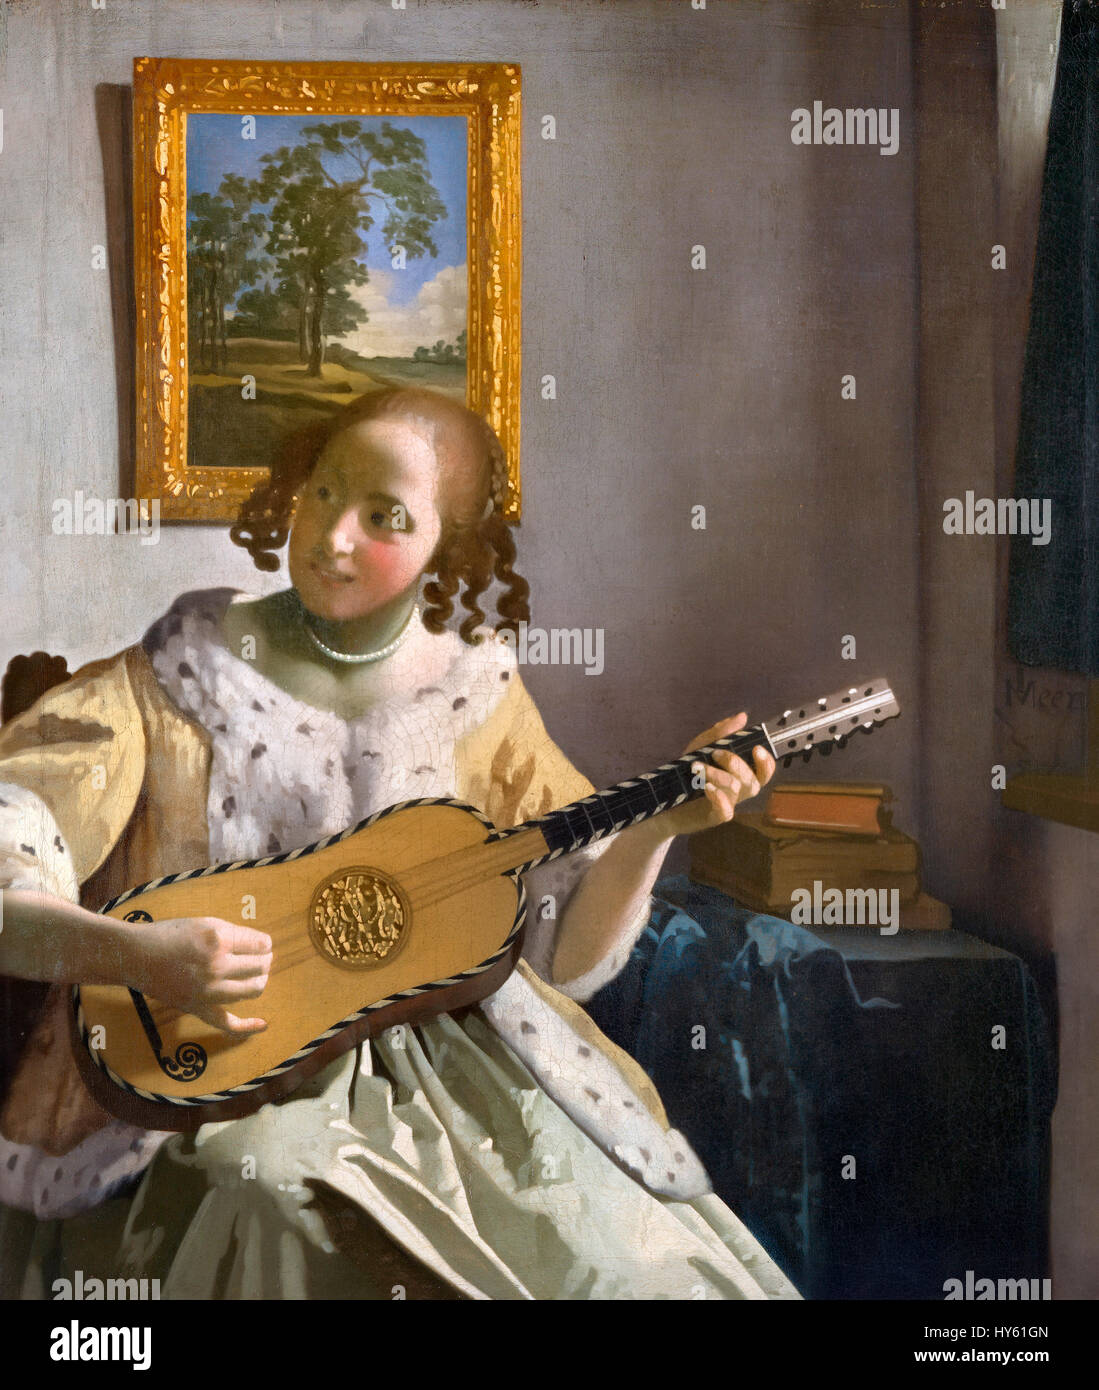 Vermeer. 'The Guitar Player' by Johannes Vermeer, oil on canvas, c.1672 - Stock Image